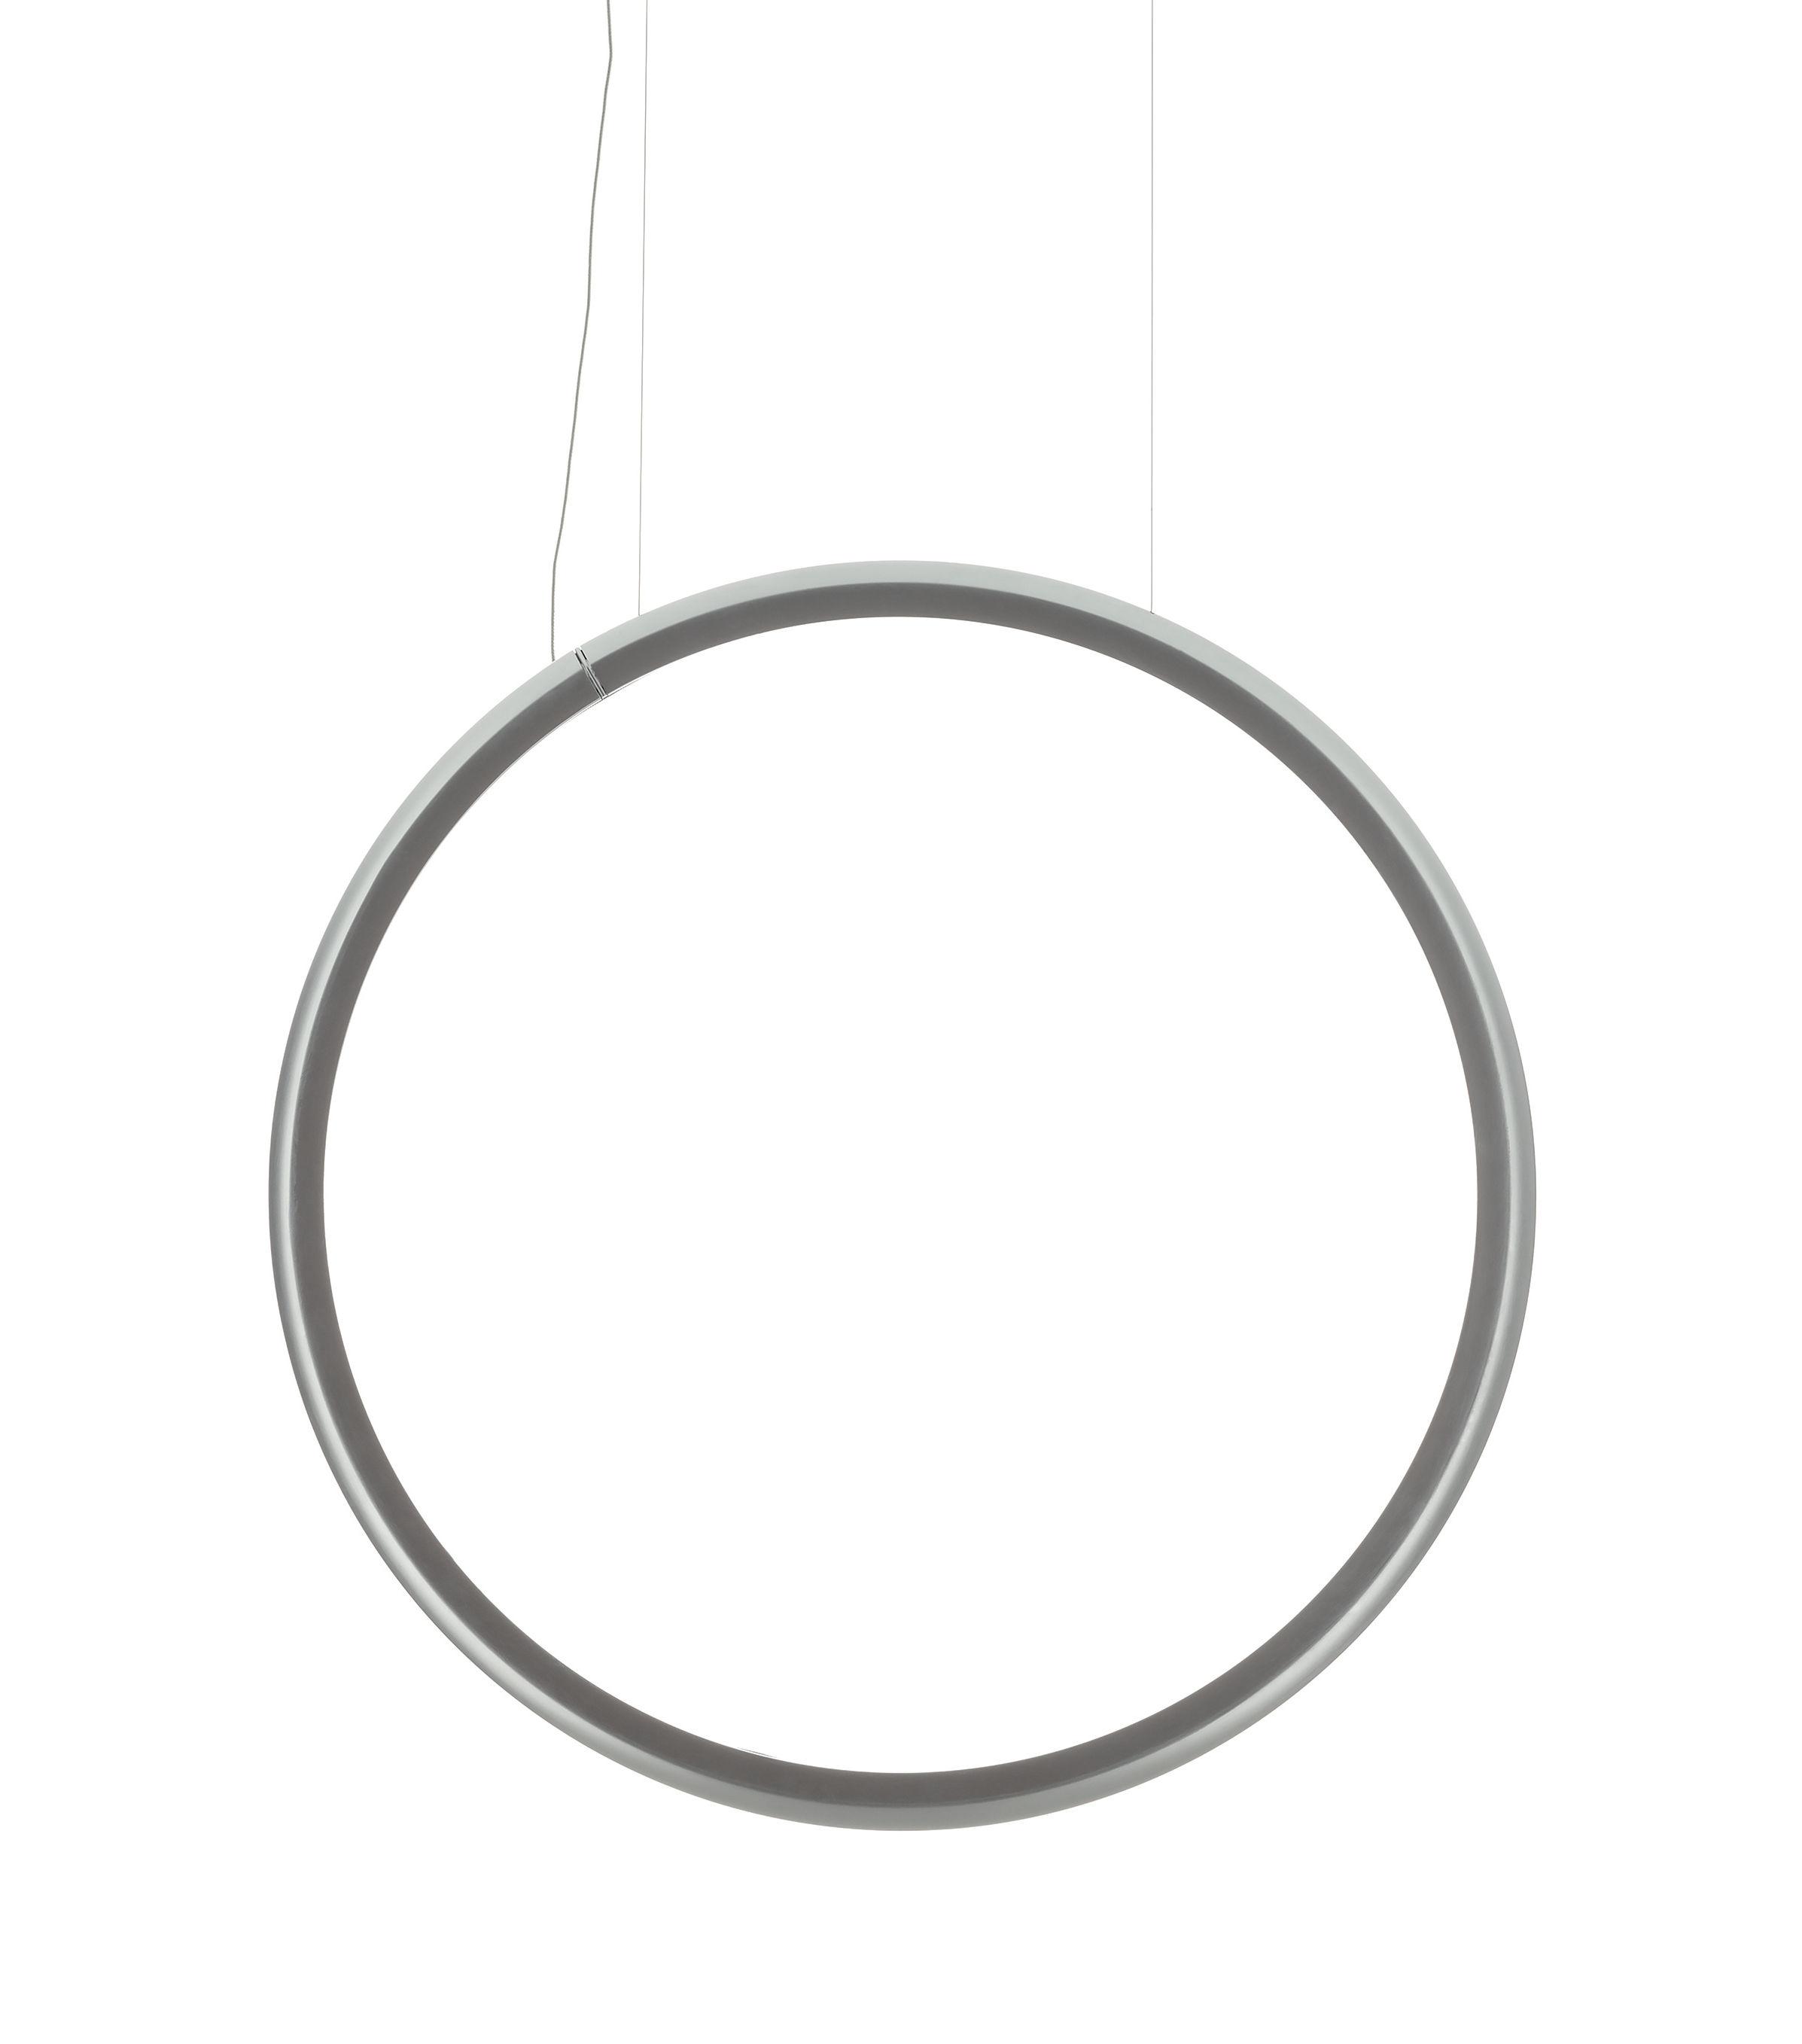 Lighting - Pendant Lighting - Discovery Vertical LED Pendant - / Ø 100 cm by Artemide - Transparent / Ø 100 cm - Aluminium, Technopolymer